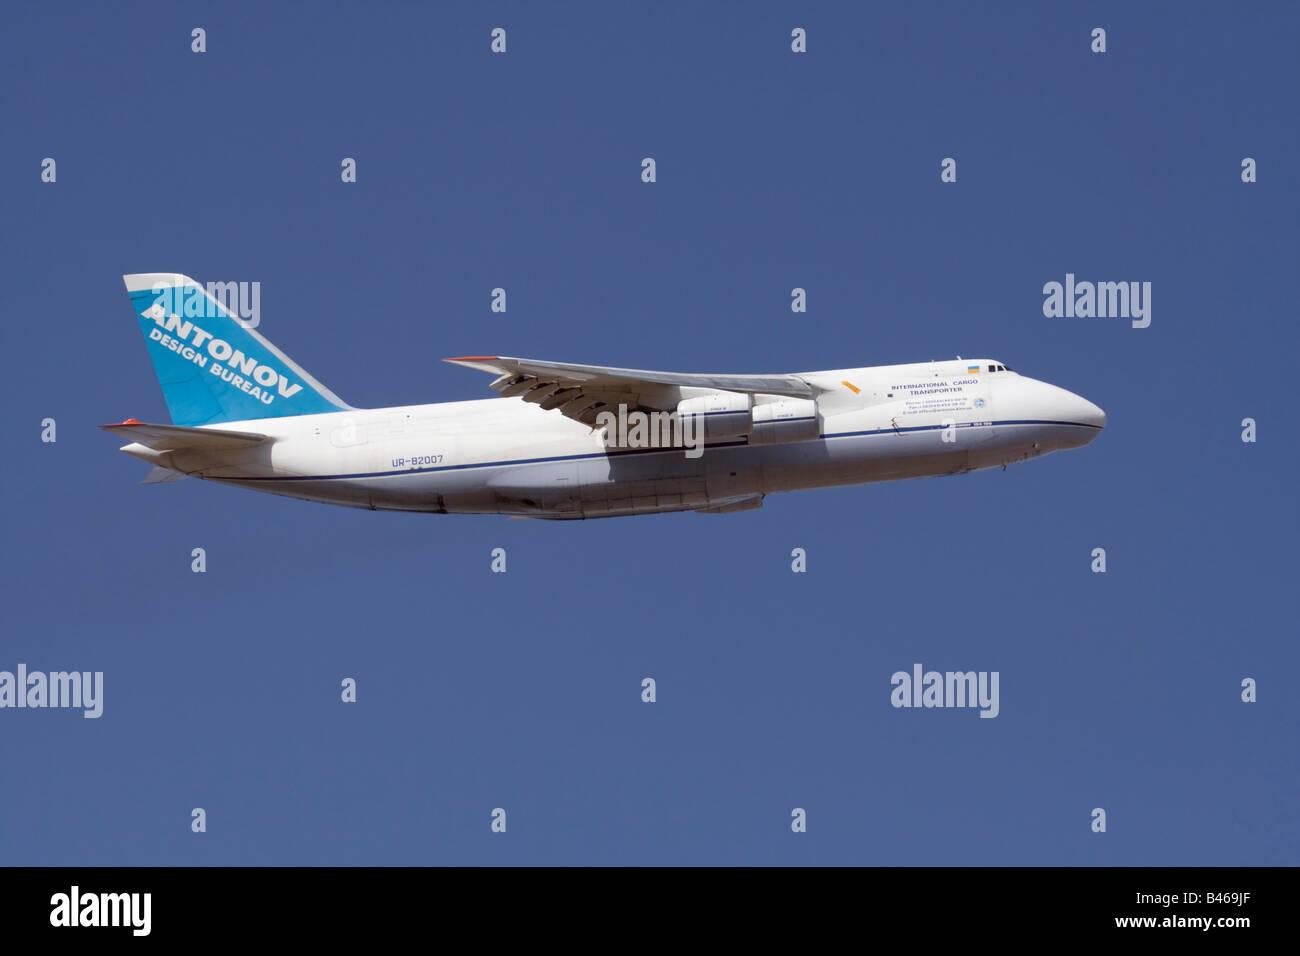 Air freight transport. Antonov Design Bureau An-124 Ruslan heavy cargo jet in flight against a clear blue sky - Stock Image